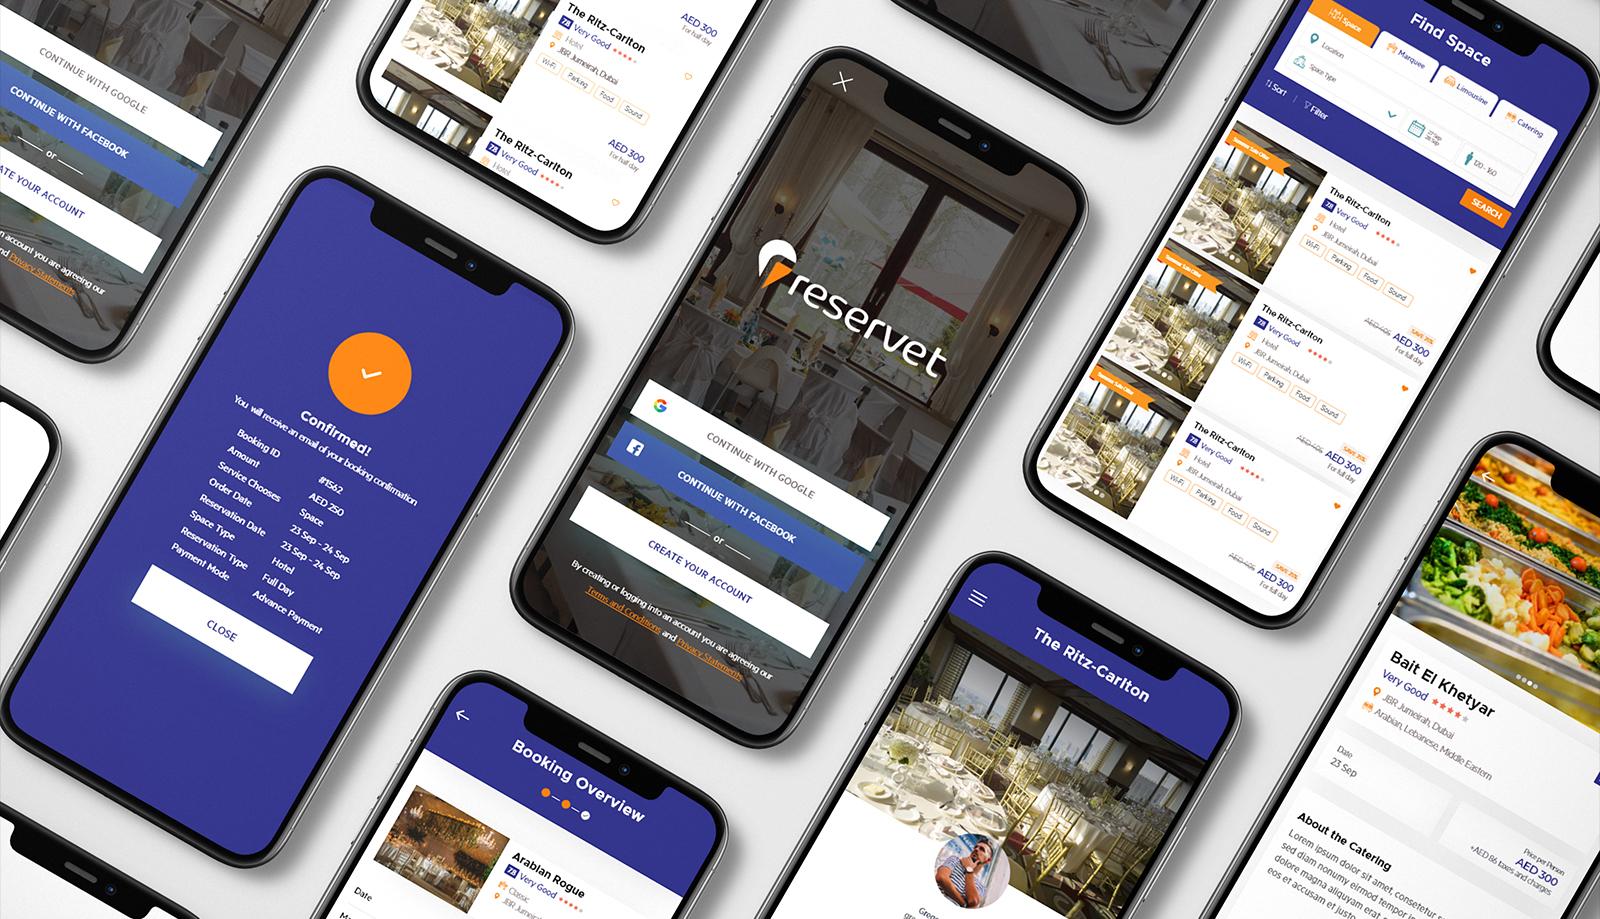 Reservet - Web & Mobile App Development By Element8